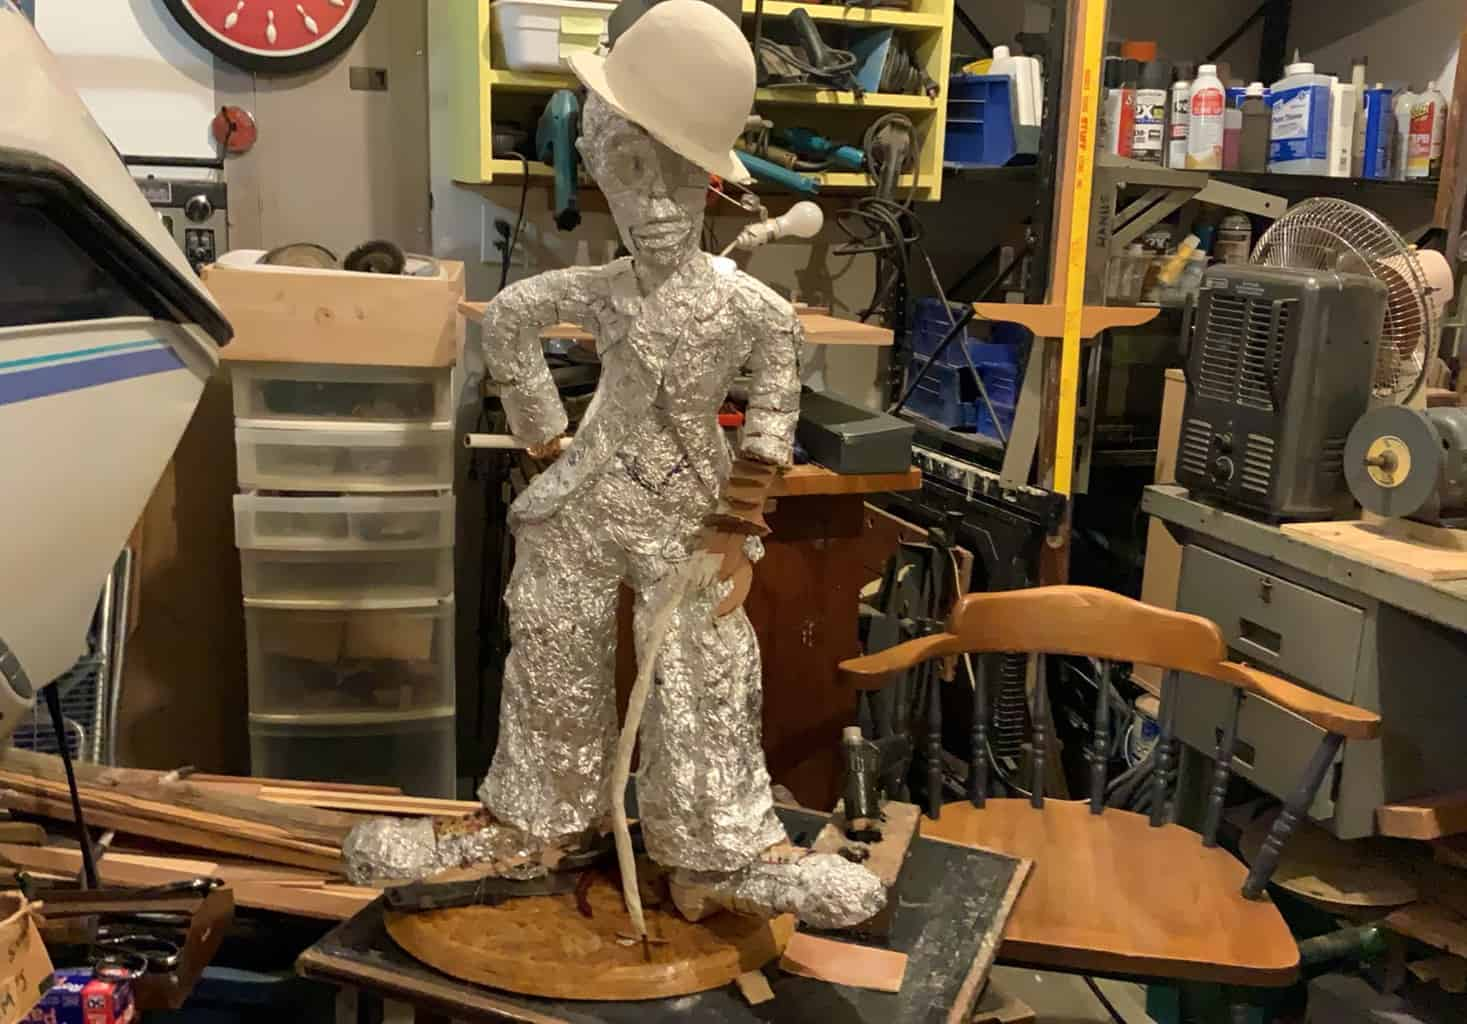 Charlie Chaplin sculpture in progress